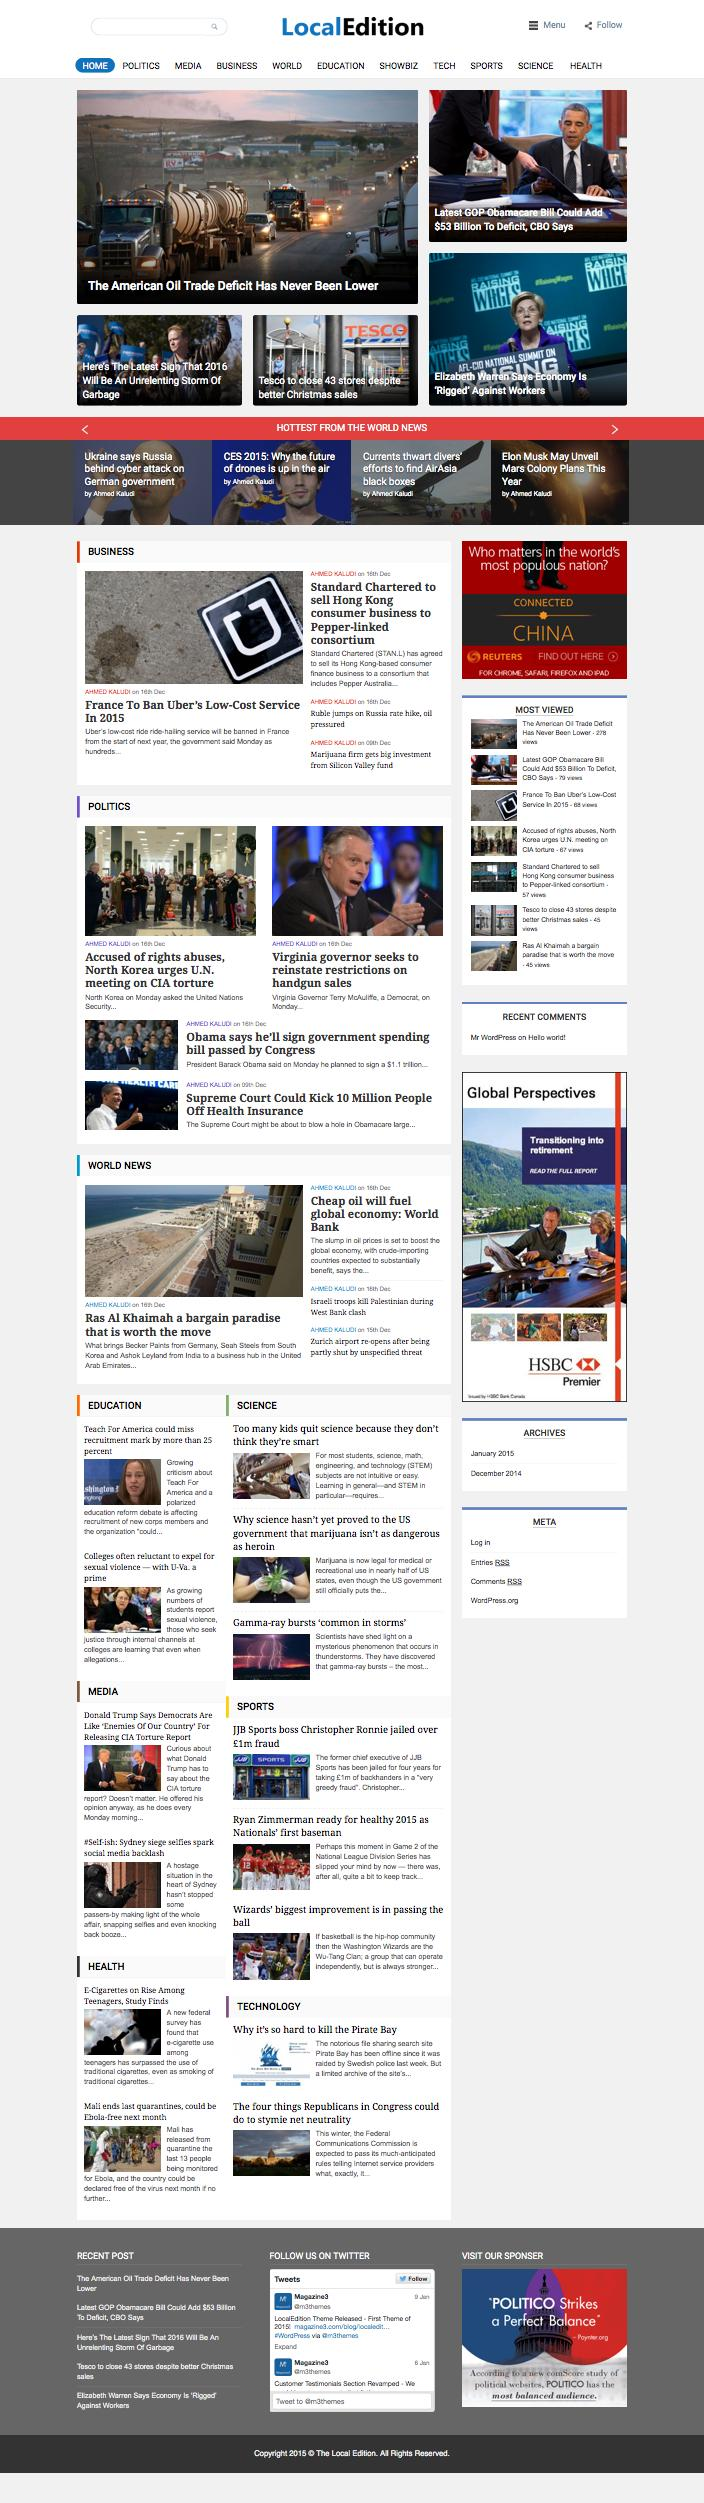 LocalEdition WordPress Modern Newspaper Theme 2015